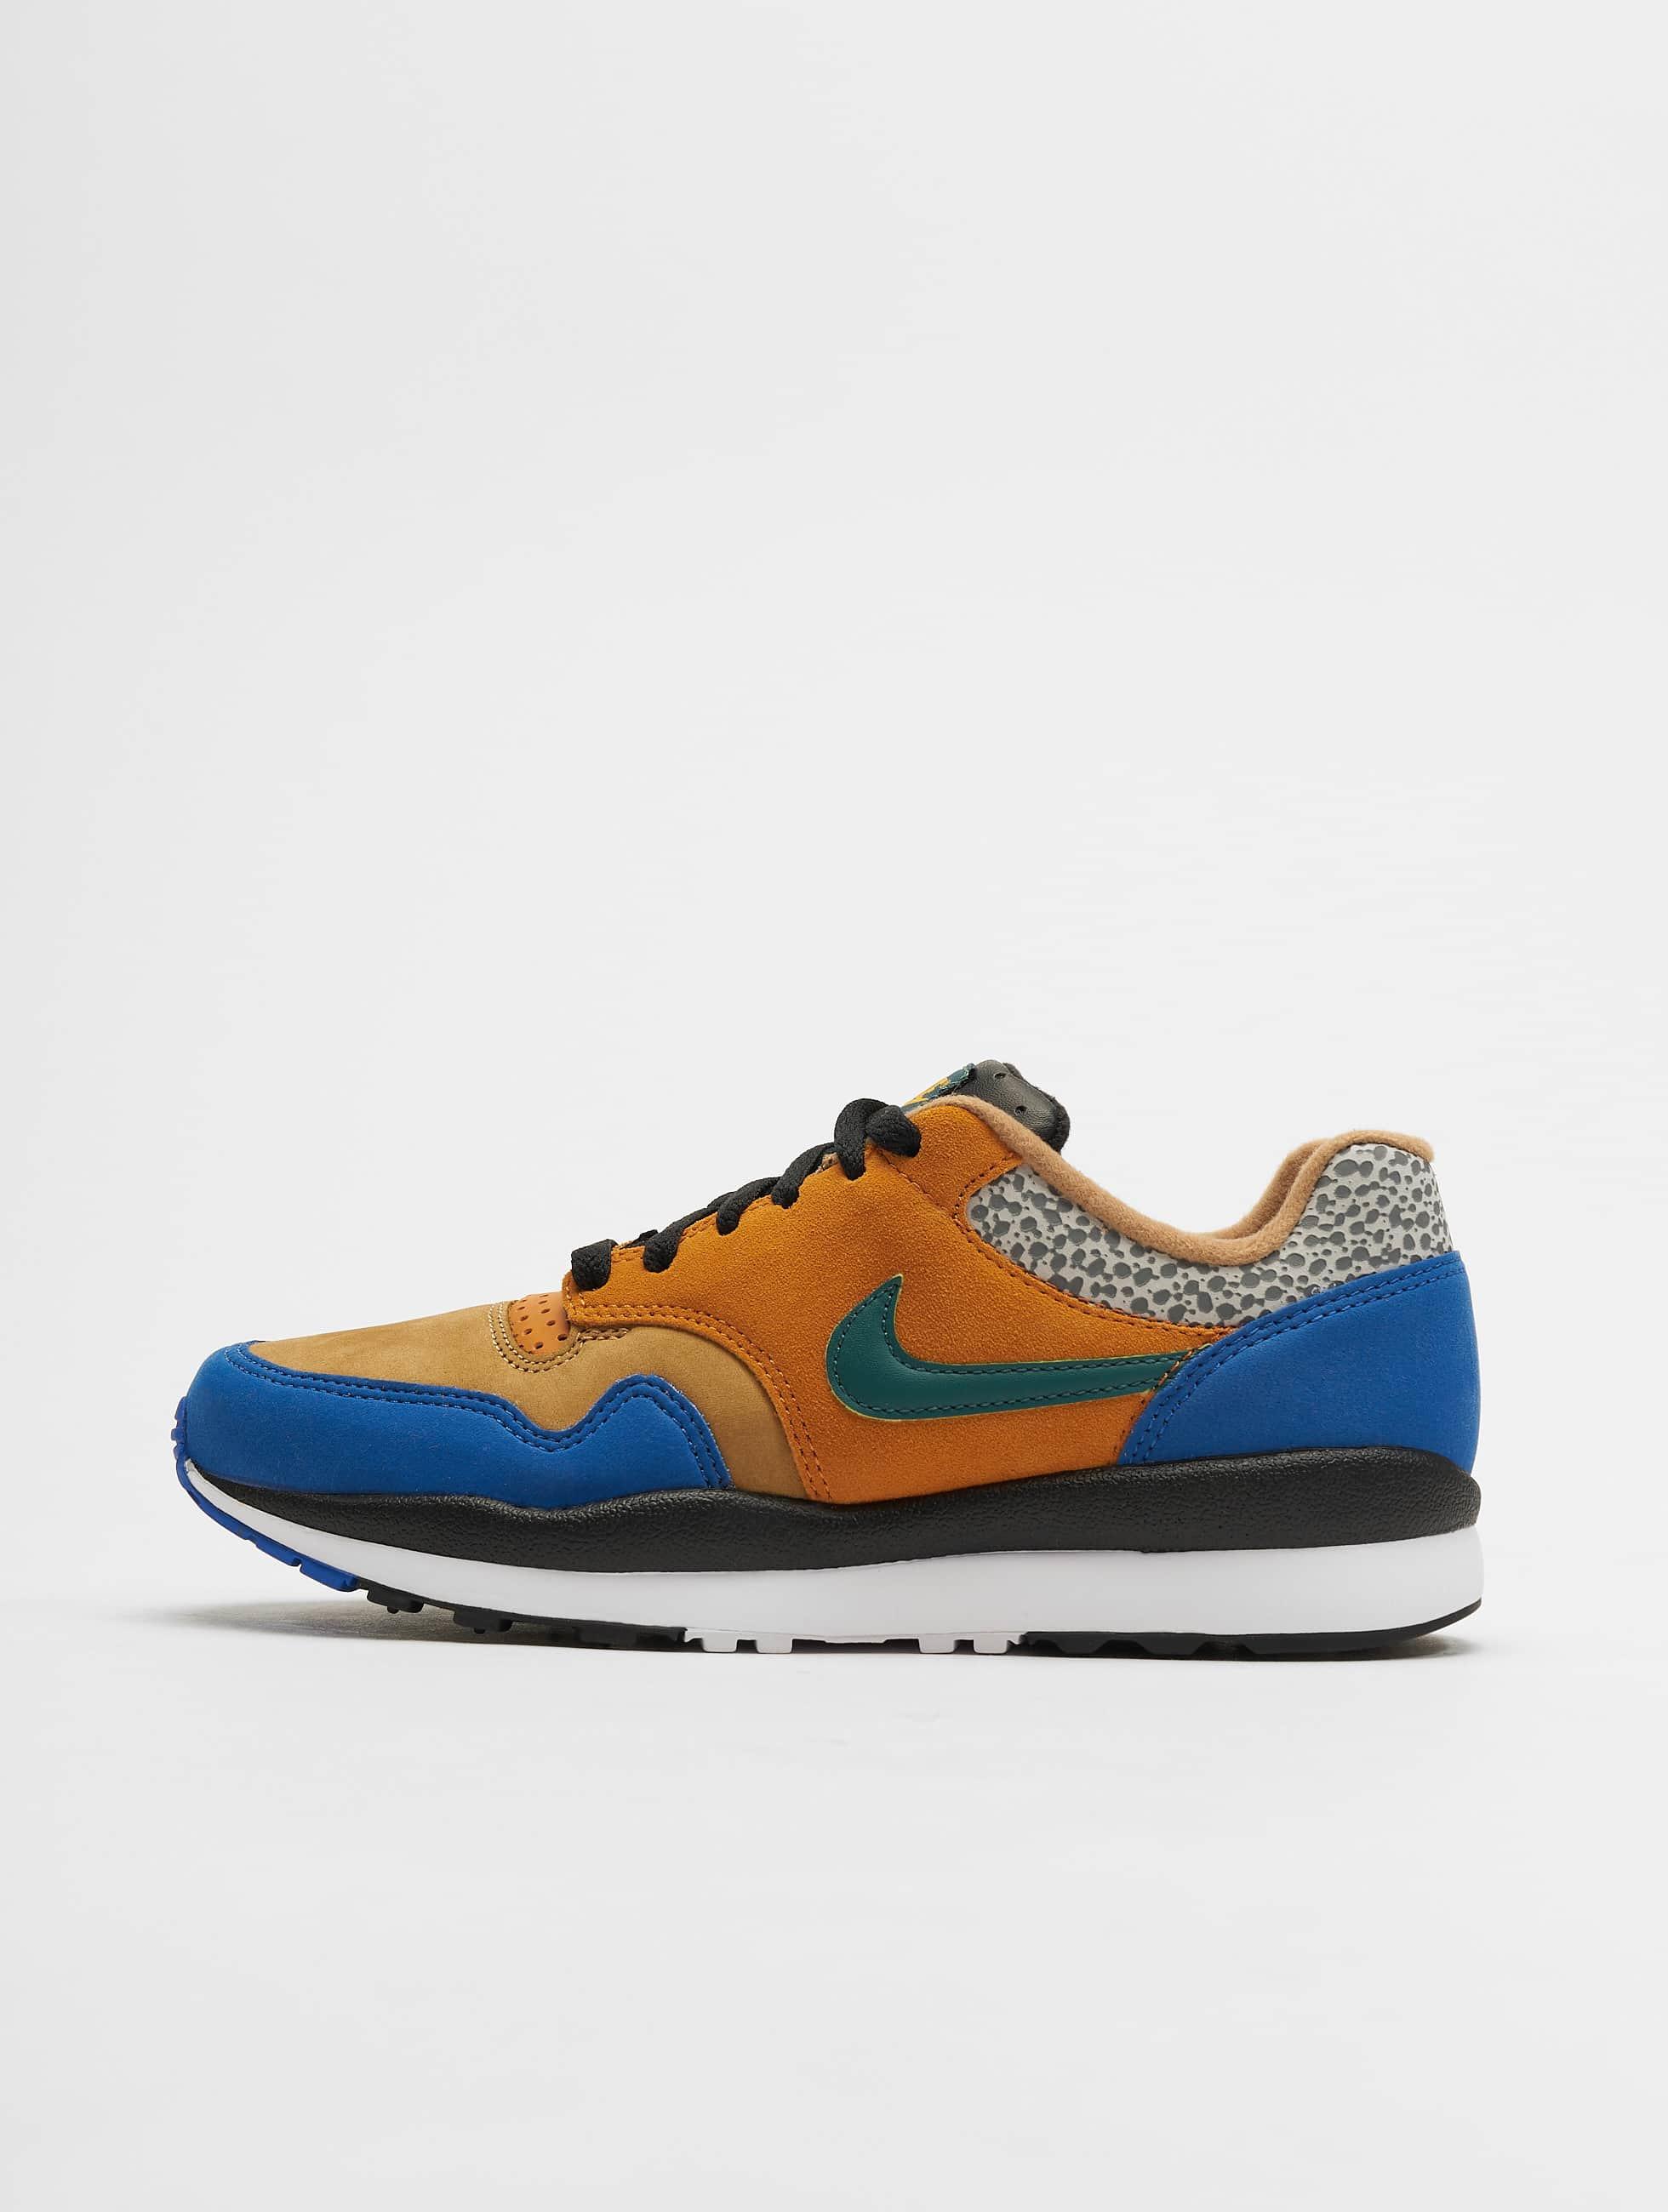 Nike Air Safari SE SP 19 Sneakers MonarchRainforest FlaxGame Royal